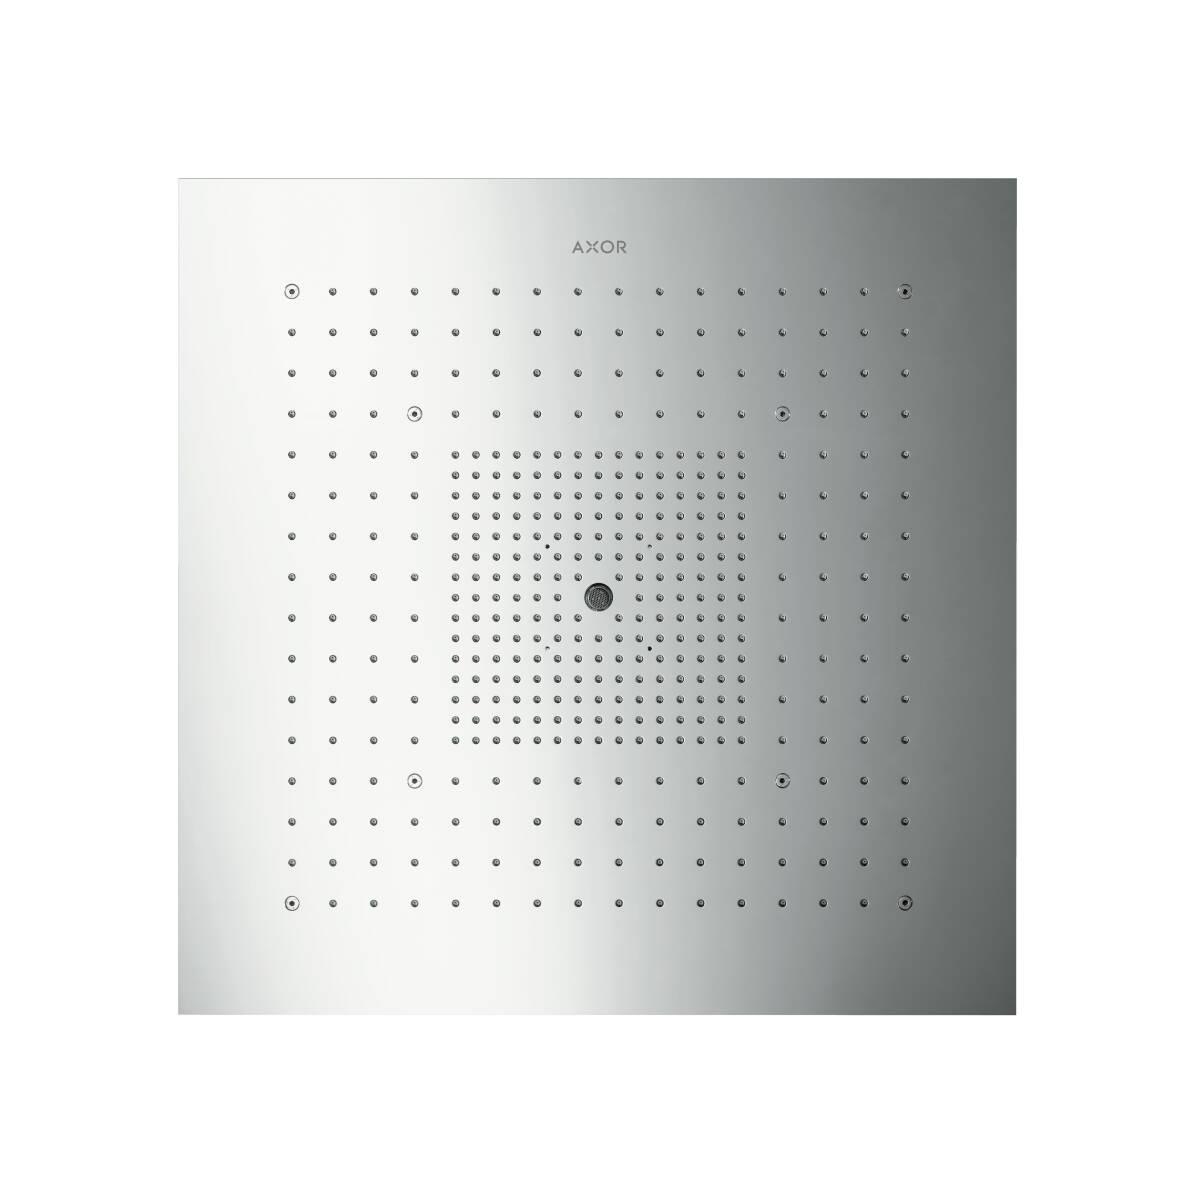 ShowerHeaven 720 x 720mm sin luz, color acero, 10625800